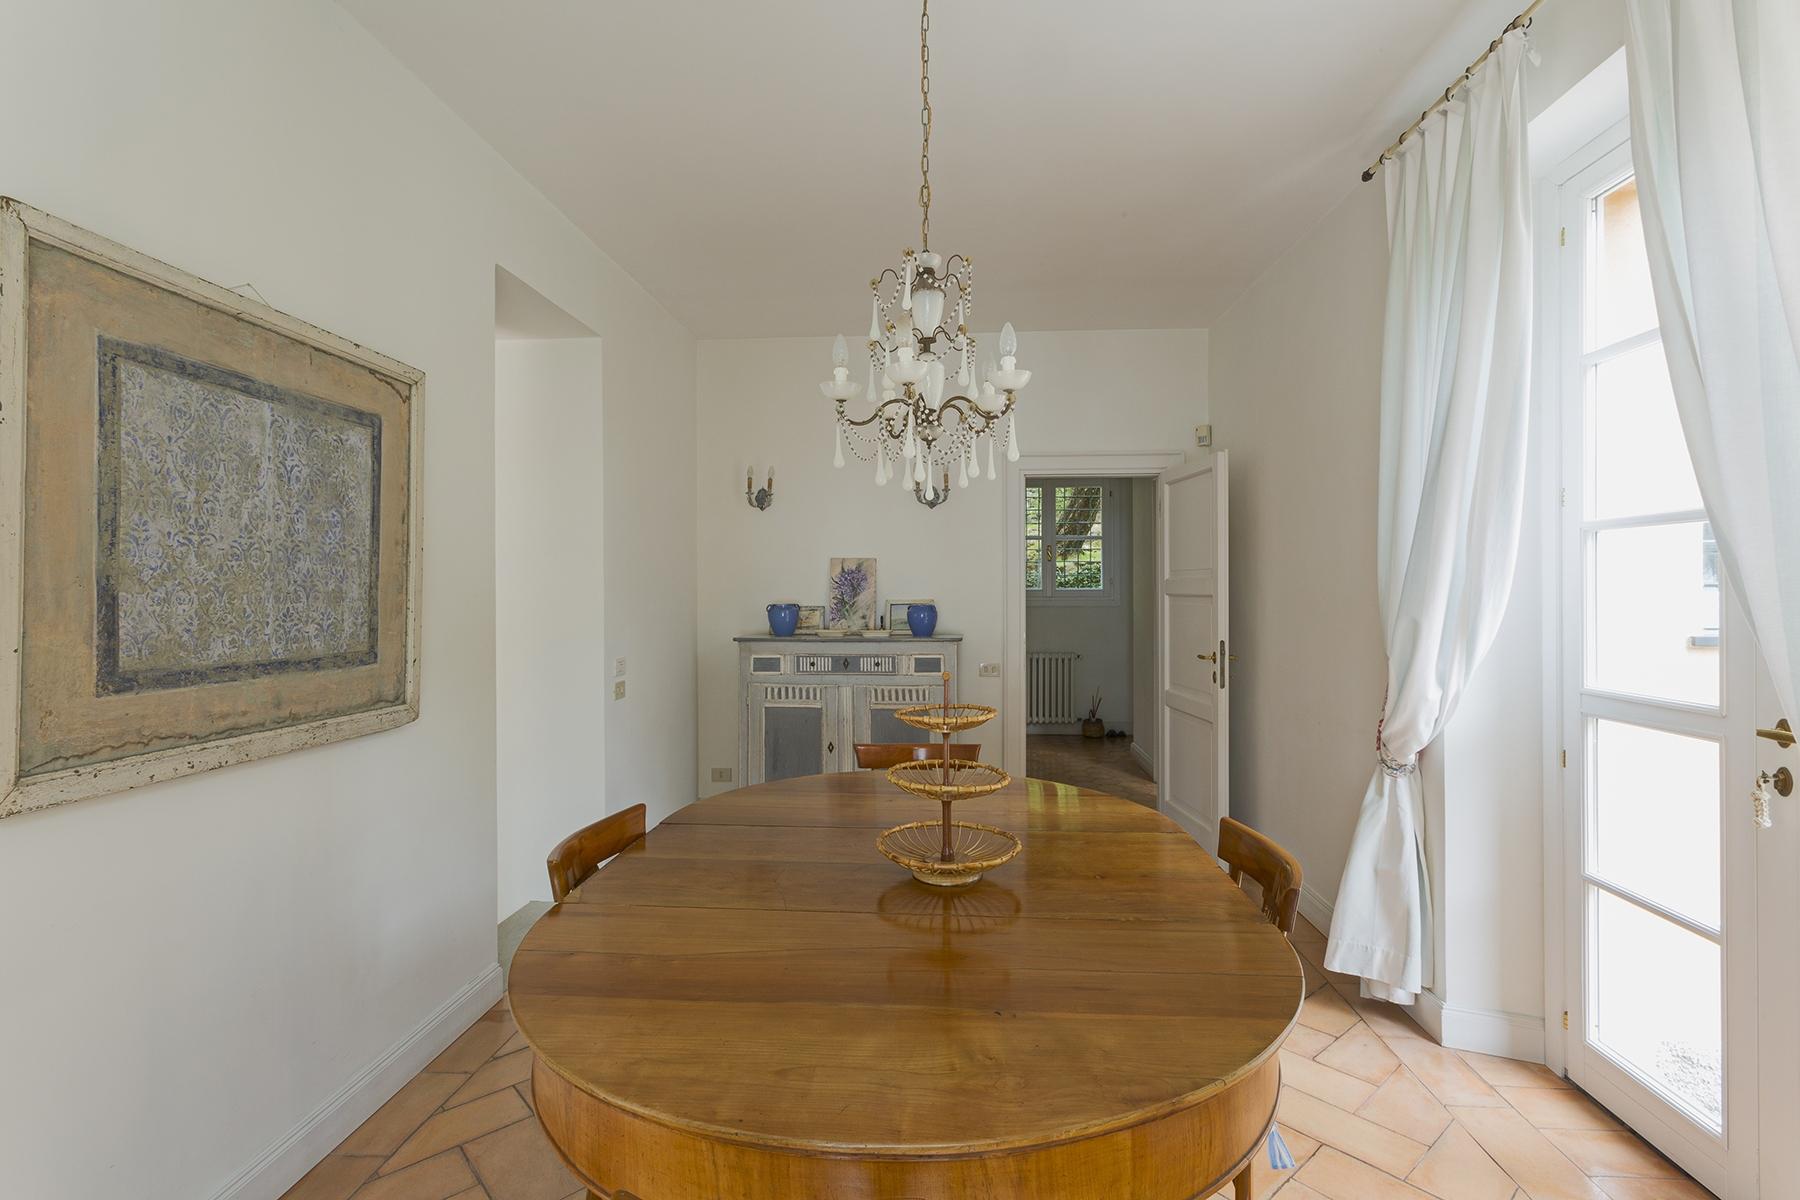 Villa in Vendita a Santa Margherita Ligure: 5 locali, 580 mq - Foto 16